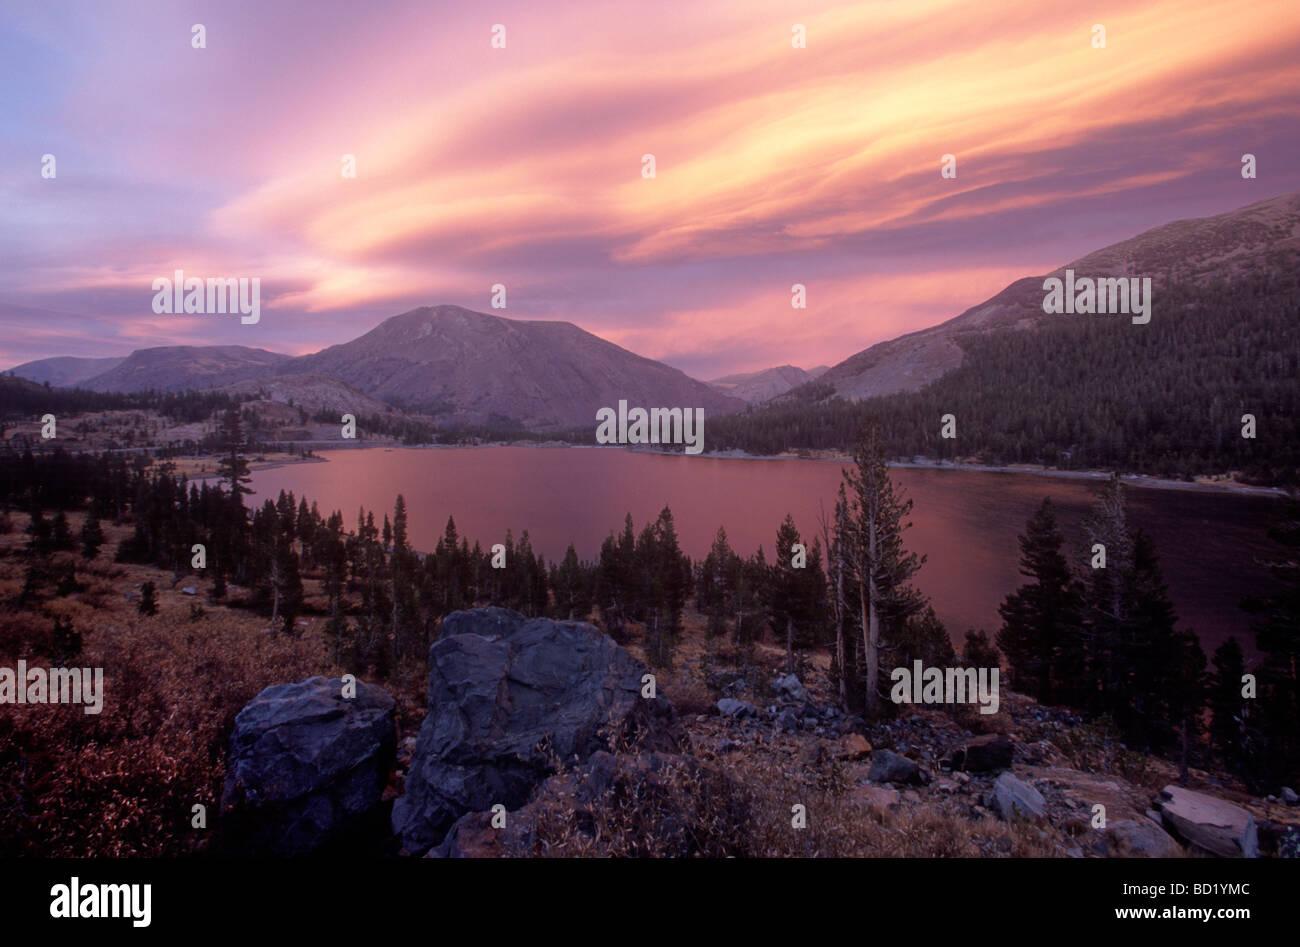 Nuvole lenticolari & montagne, Tioga Pass, California. Immagini Stock